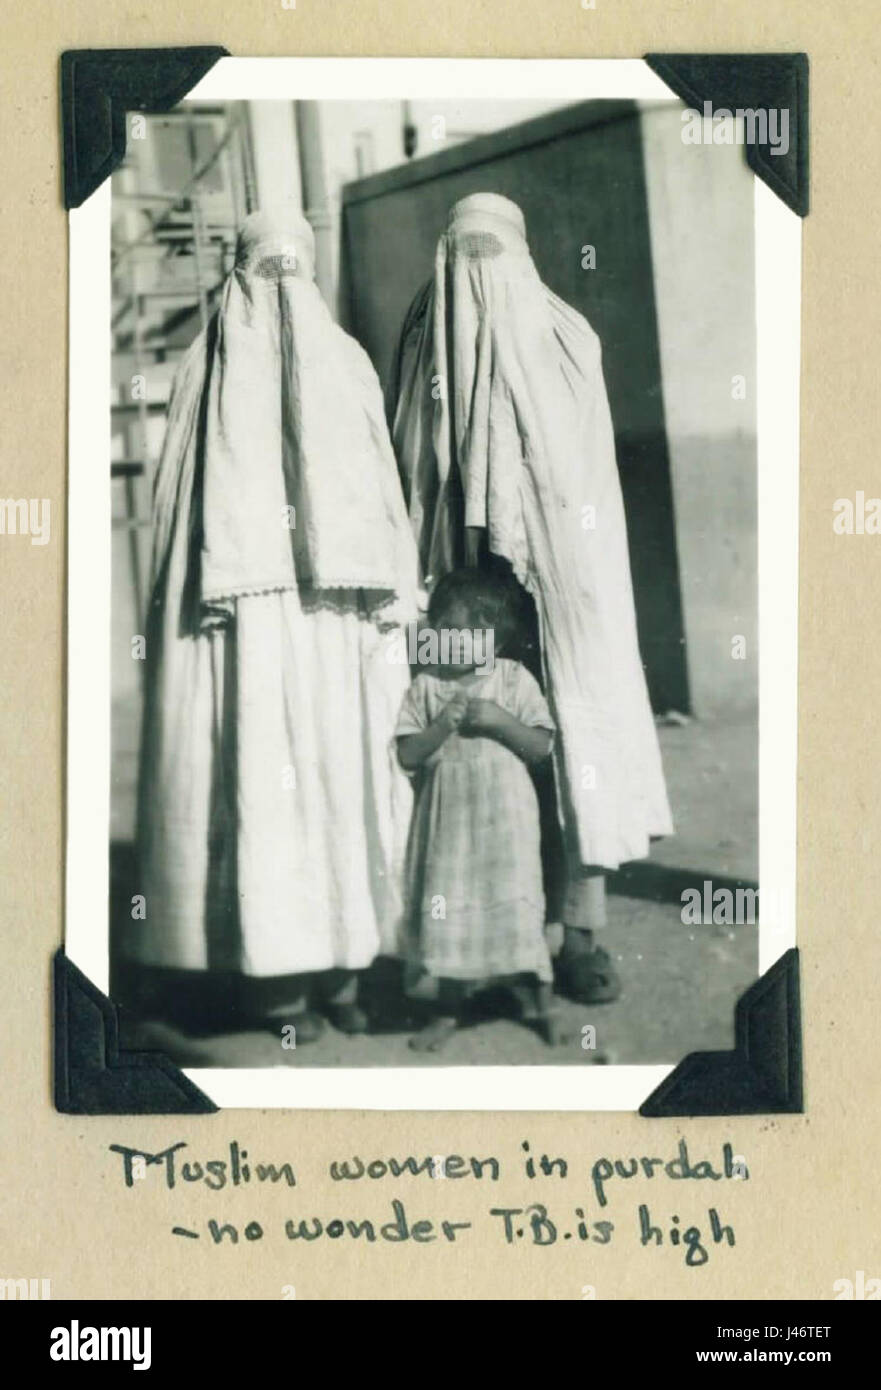 muslim women in purdah stock photo 140292512 alamy